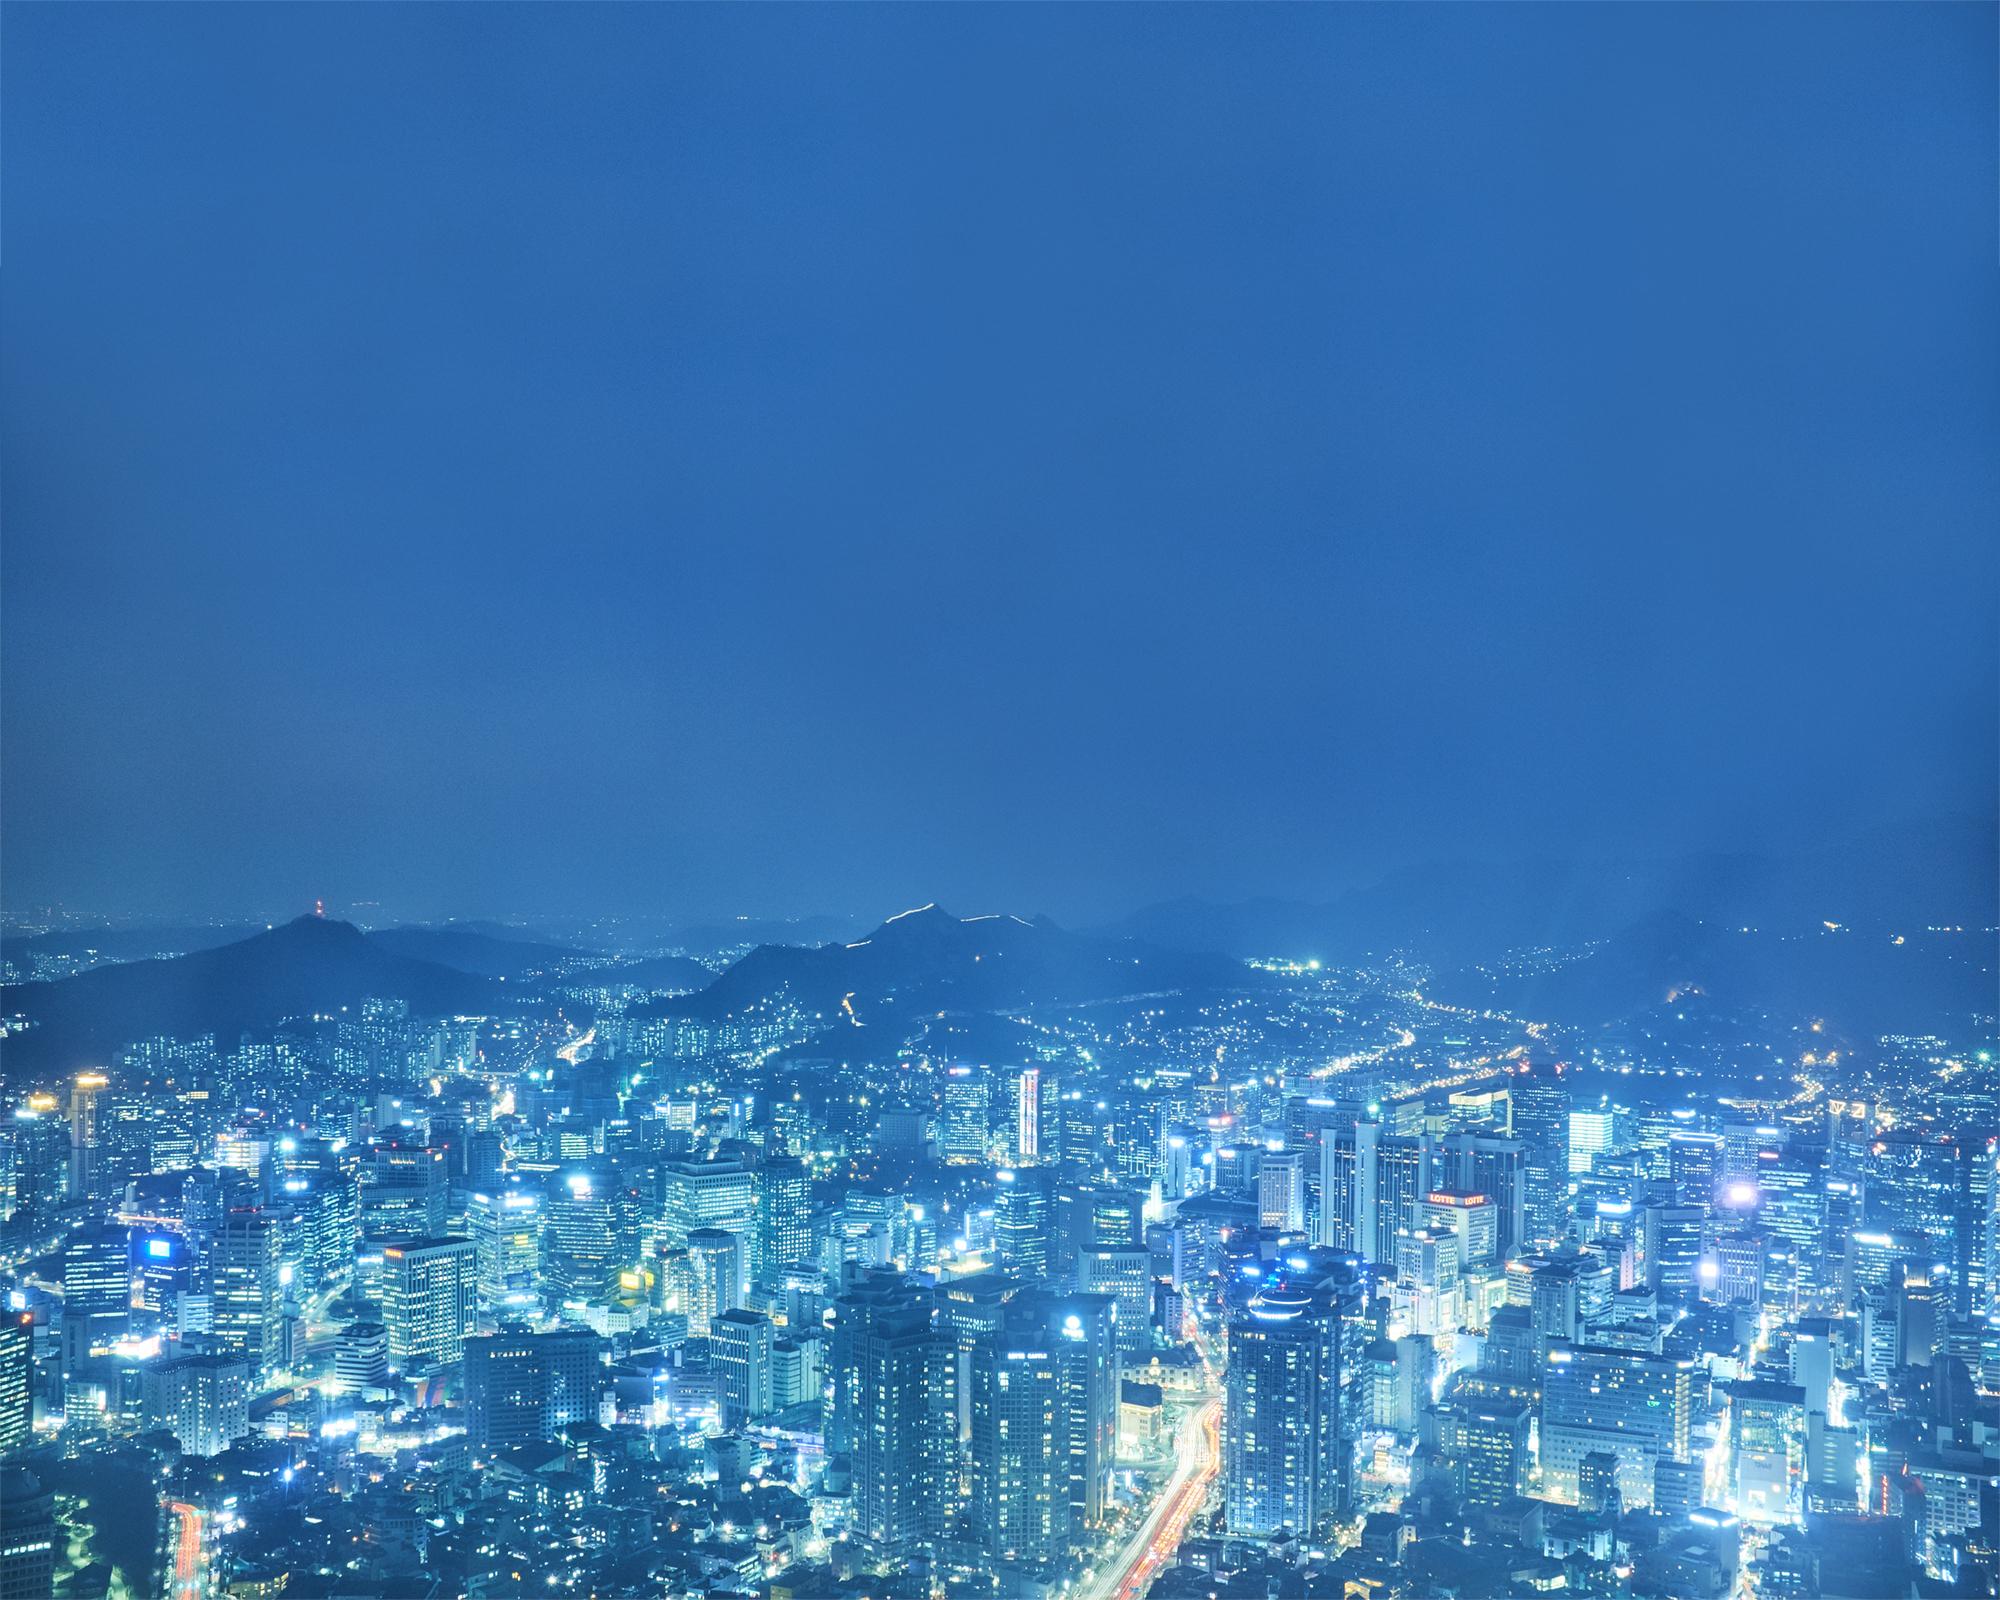 Seoul_City_Landscape.jpg